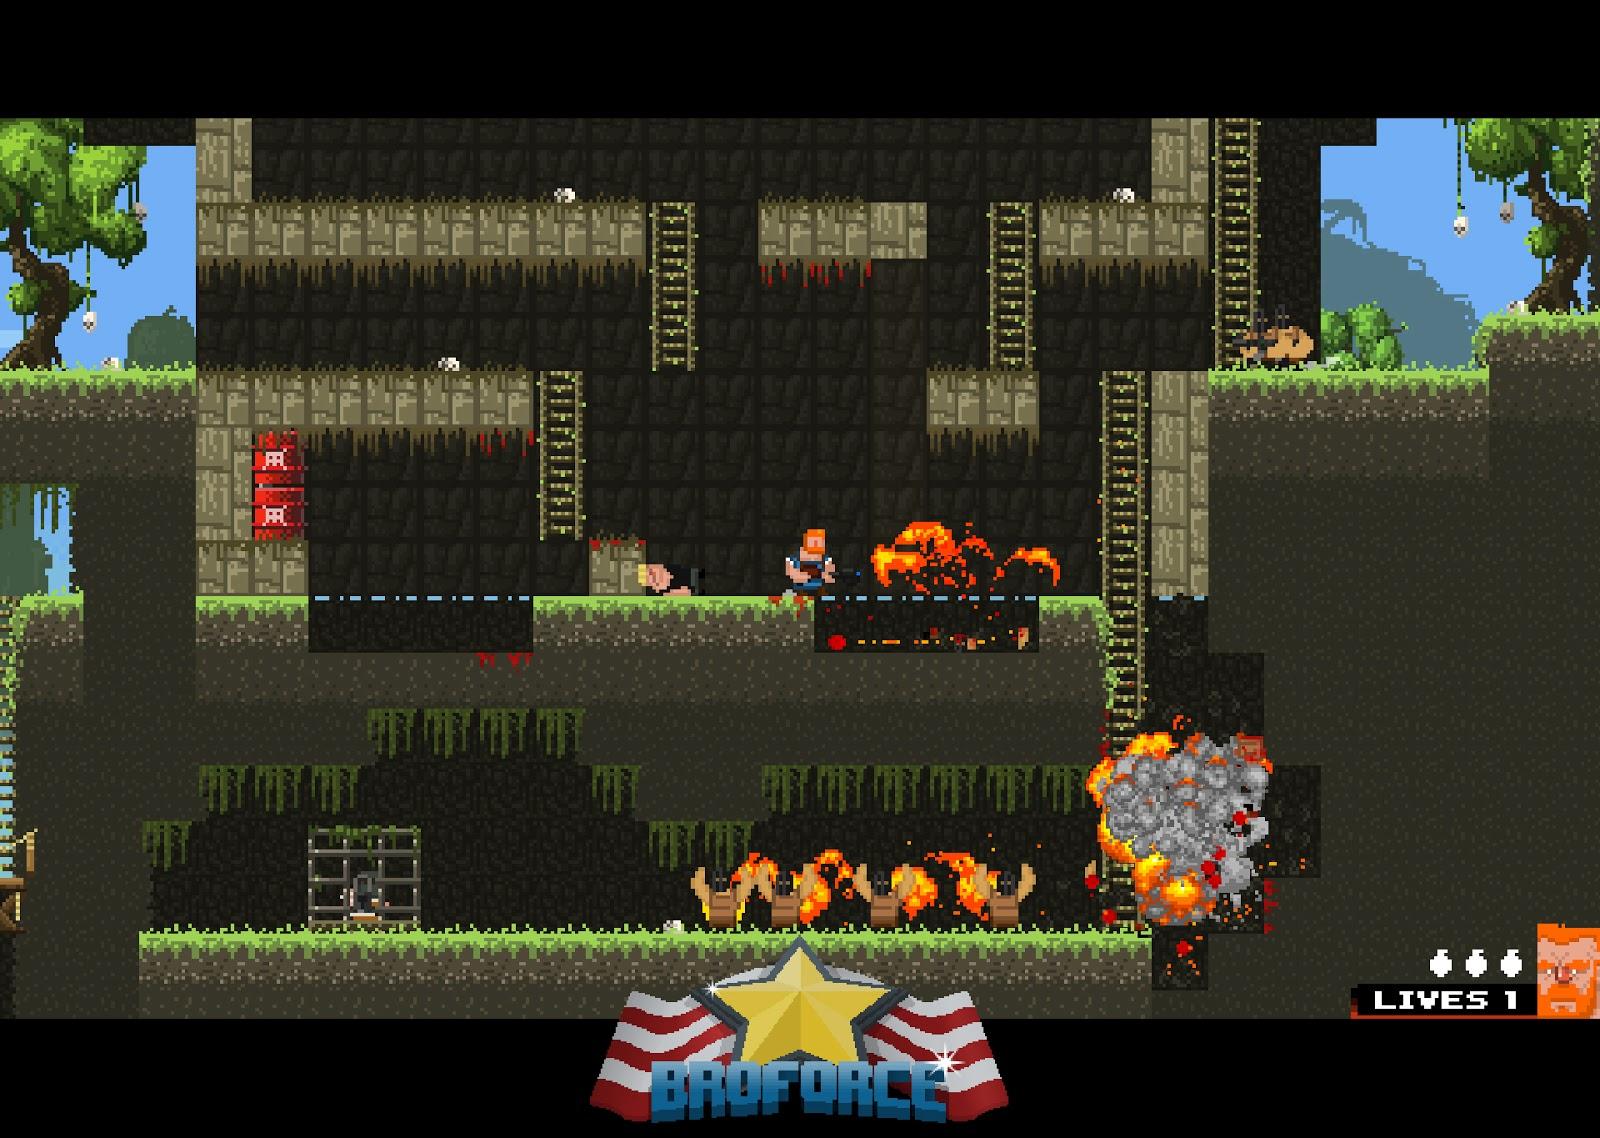 Indie Retro News: BROFORCE - An epic 2D action platformer ...